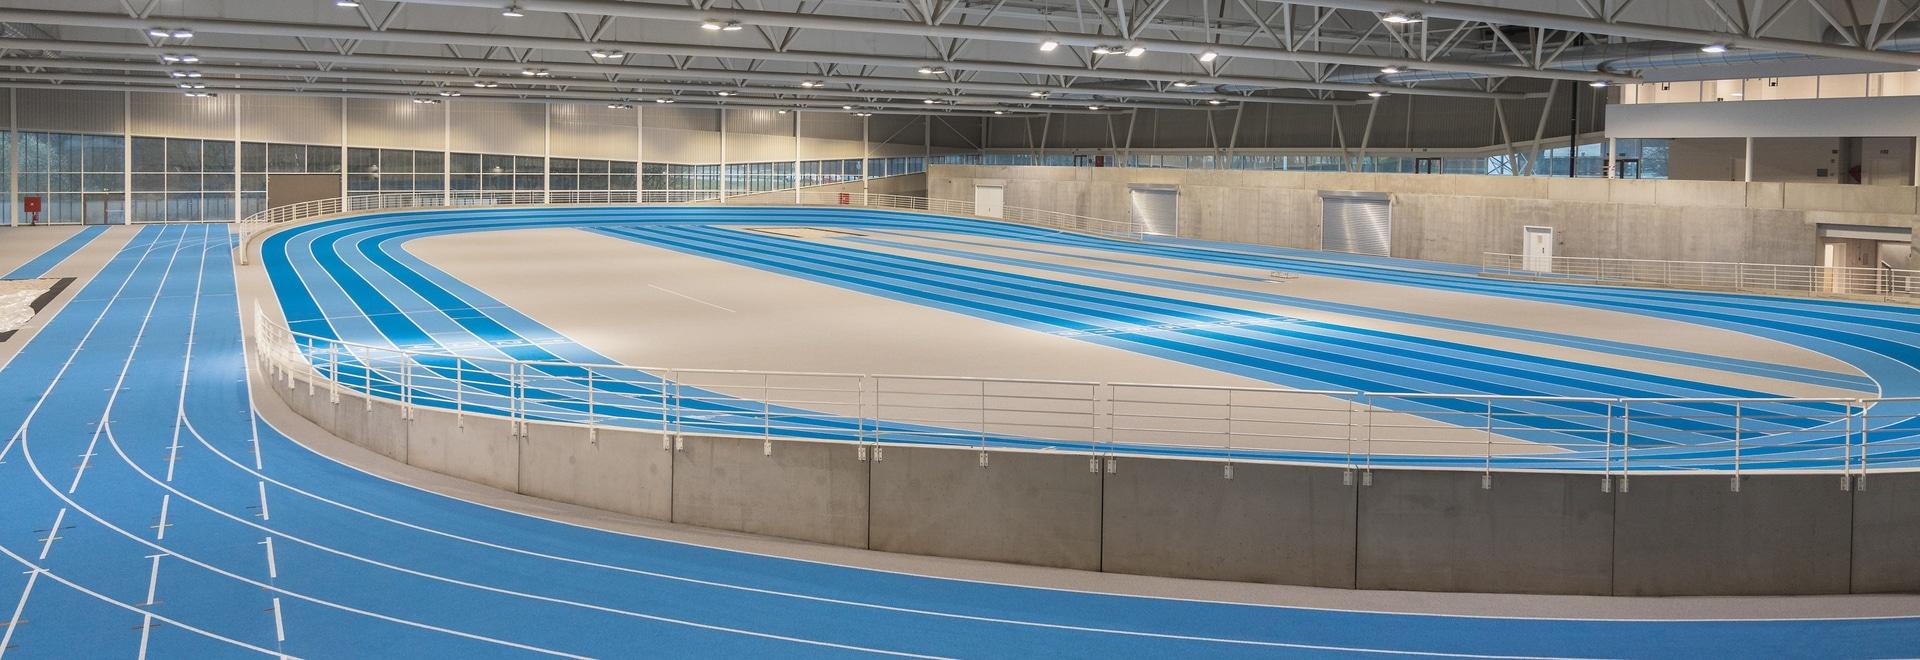 Die REGUPOL Laufbahn in der neuen Leichtathletikhalle in Louvain-la-Neuve, Belgien